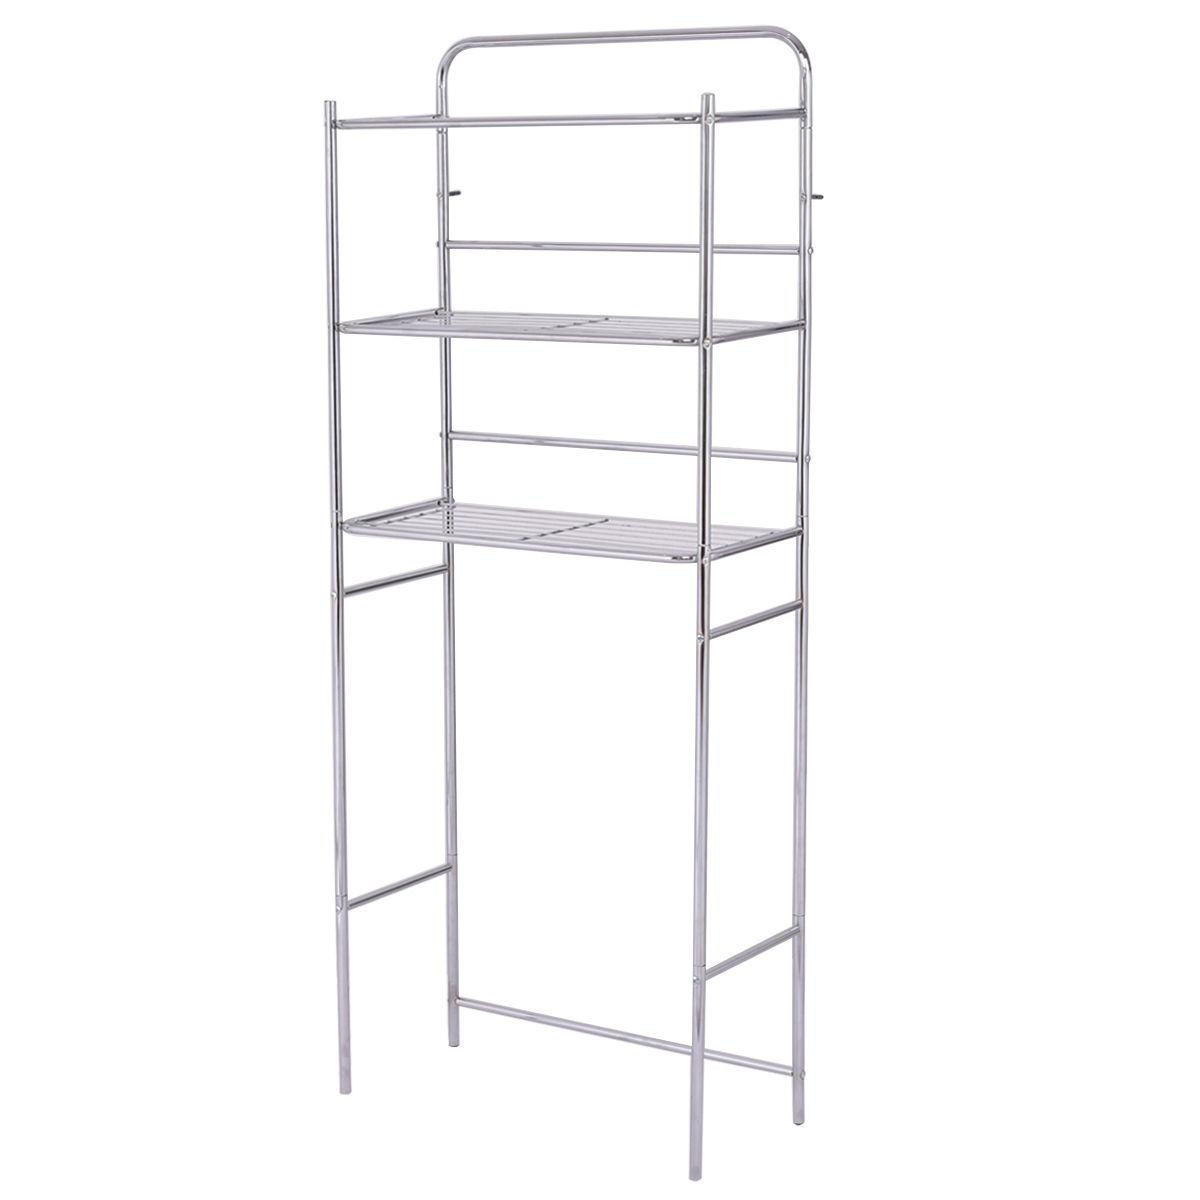 3 Tier Bathroom Storage Shelf Rack